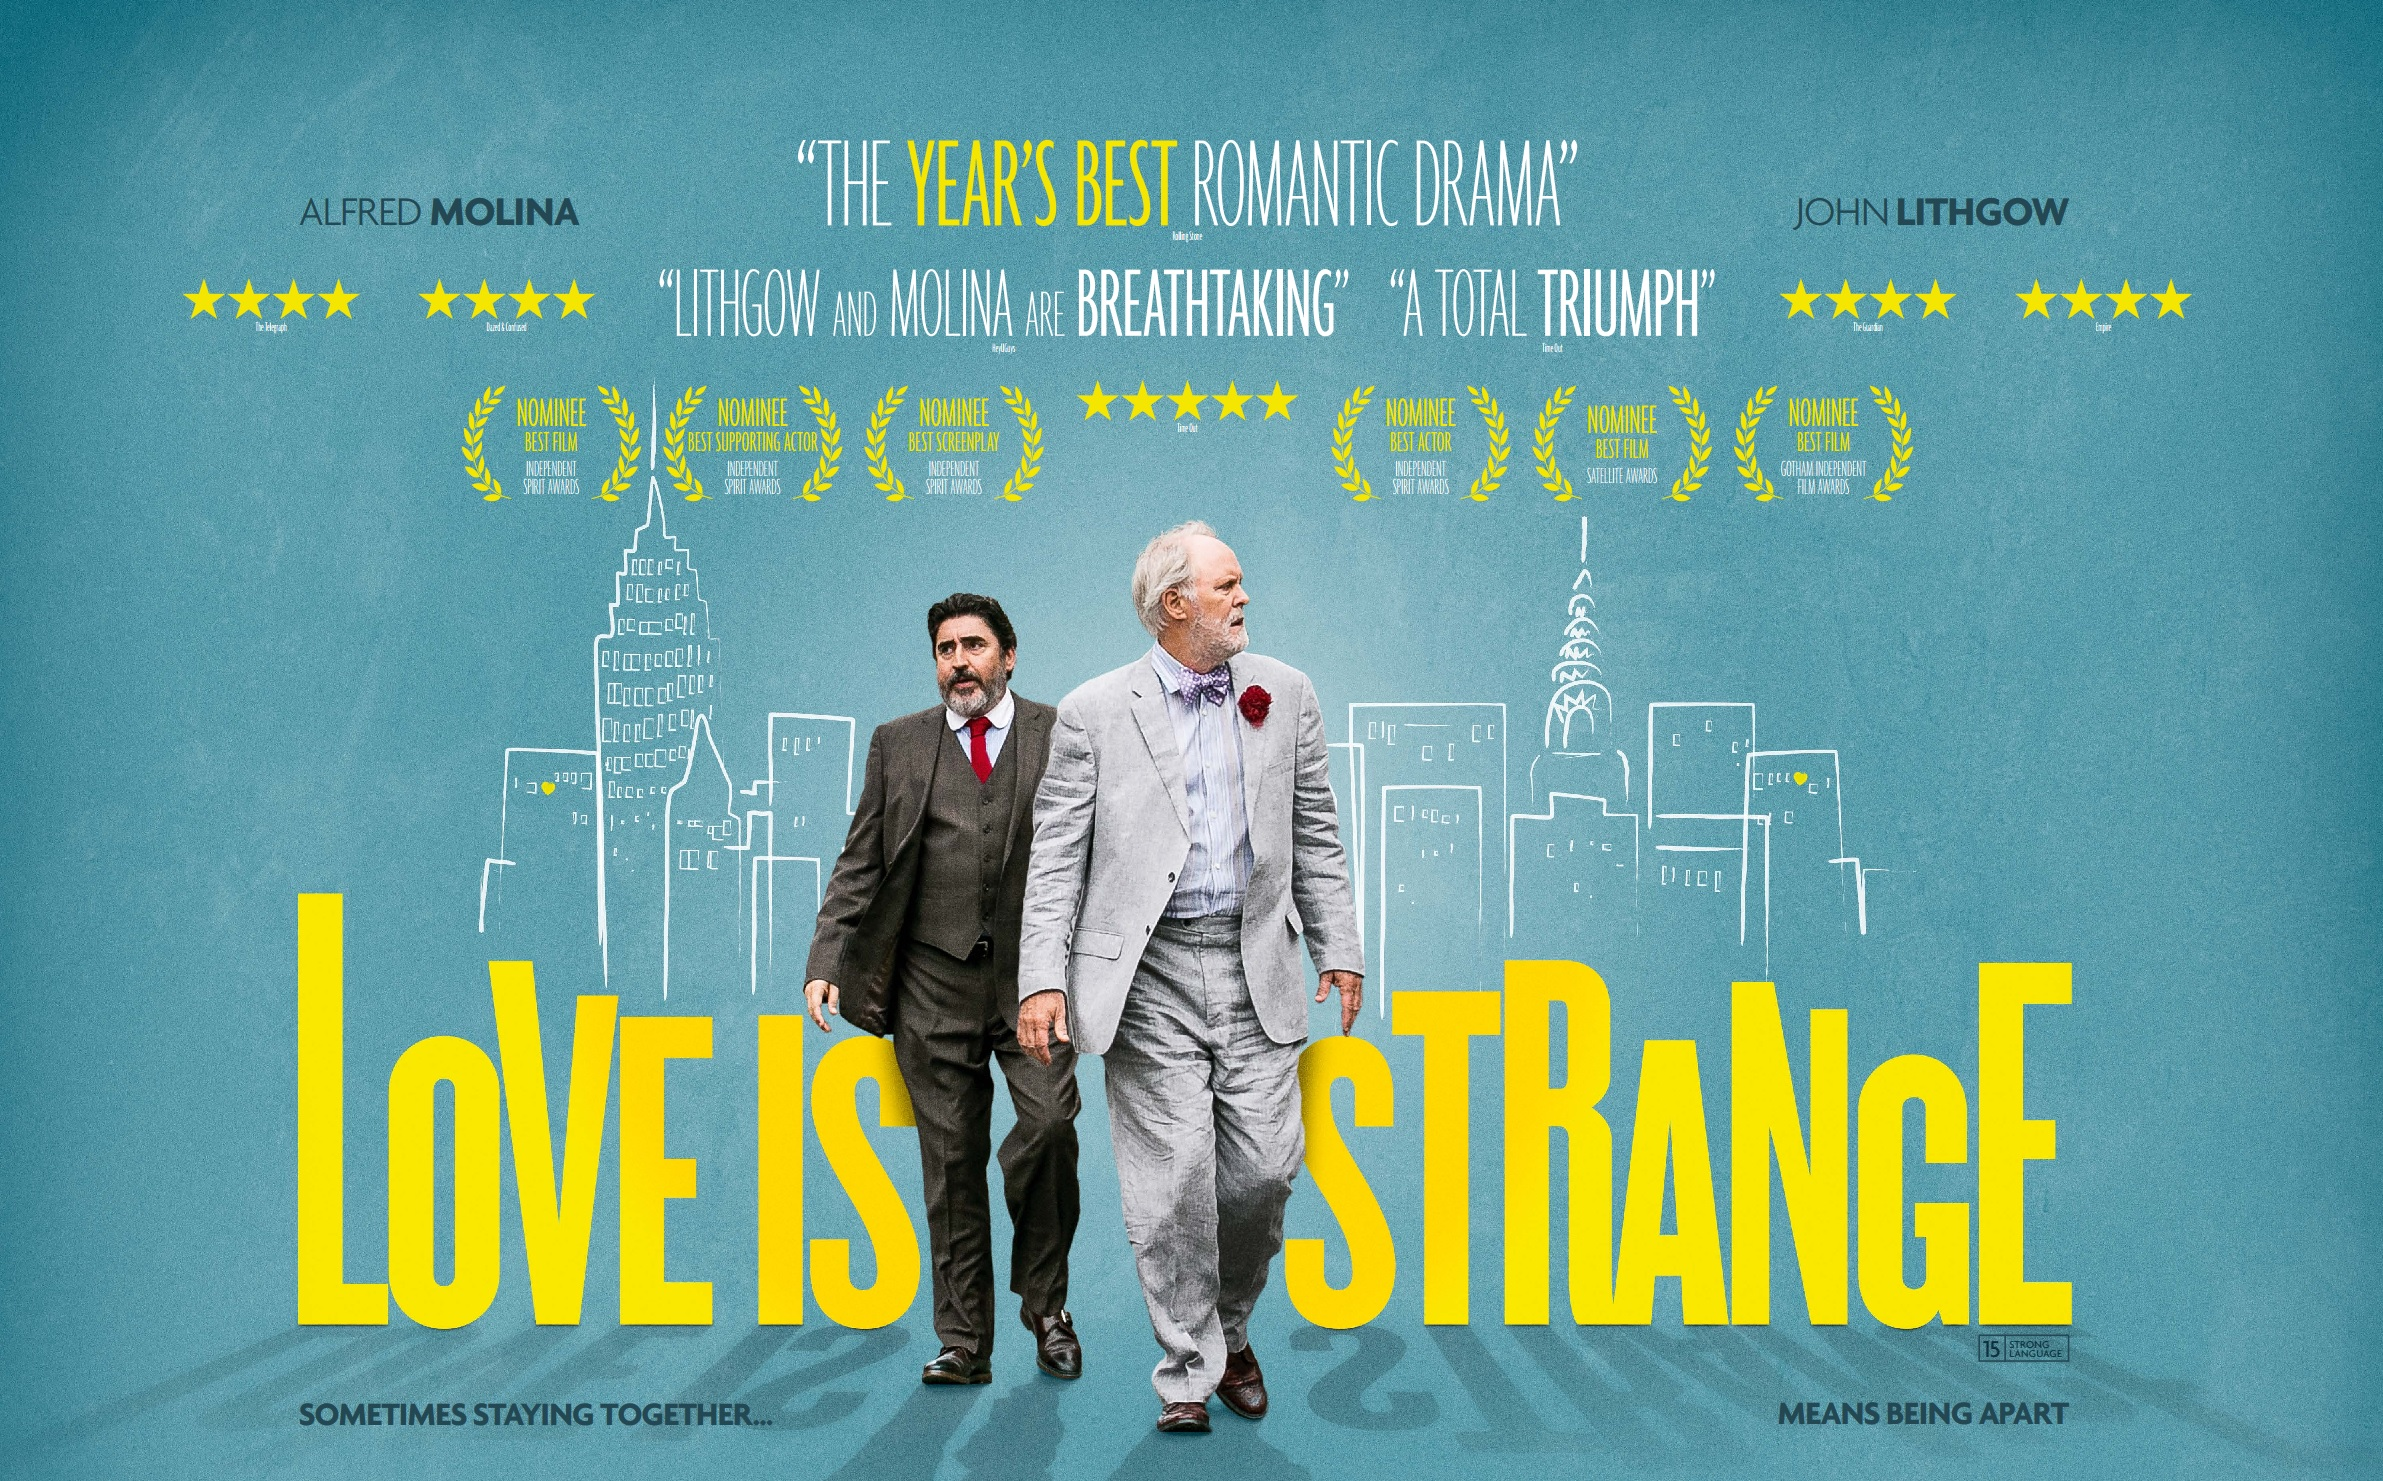 http://cinemacao.com/wp-content/uploads/2015/03/Love-is-strange-poster.jpg